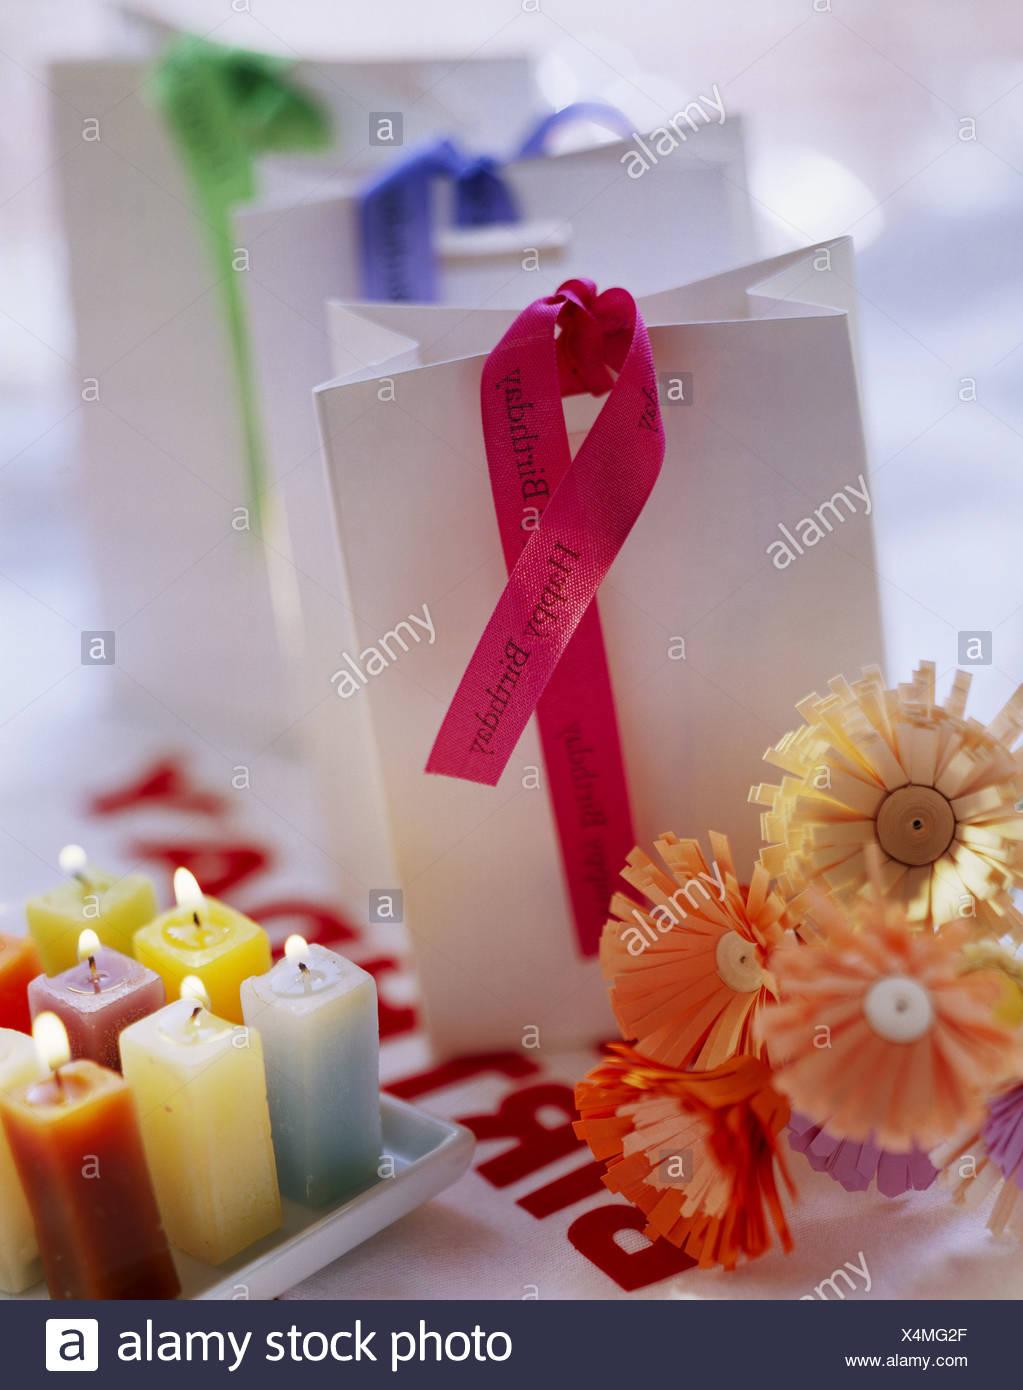 Birthday decorations paper flowers candles etc stock photo birthday decorations paper flowers candles etc izmirmasajfo